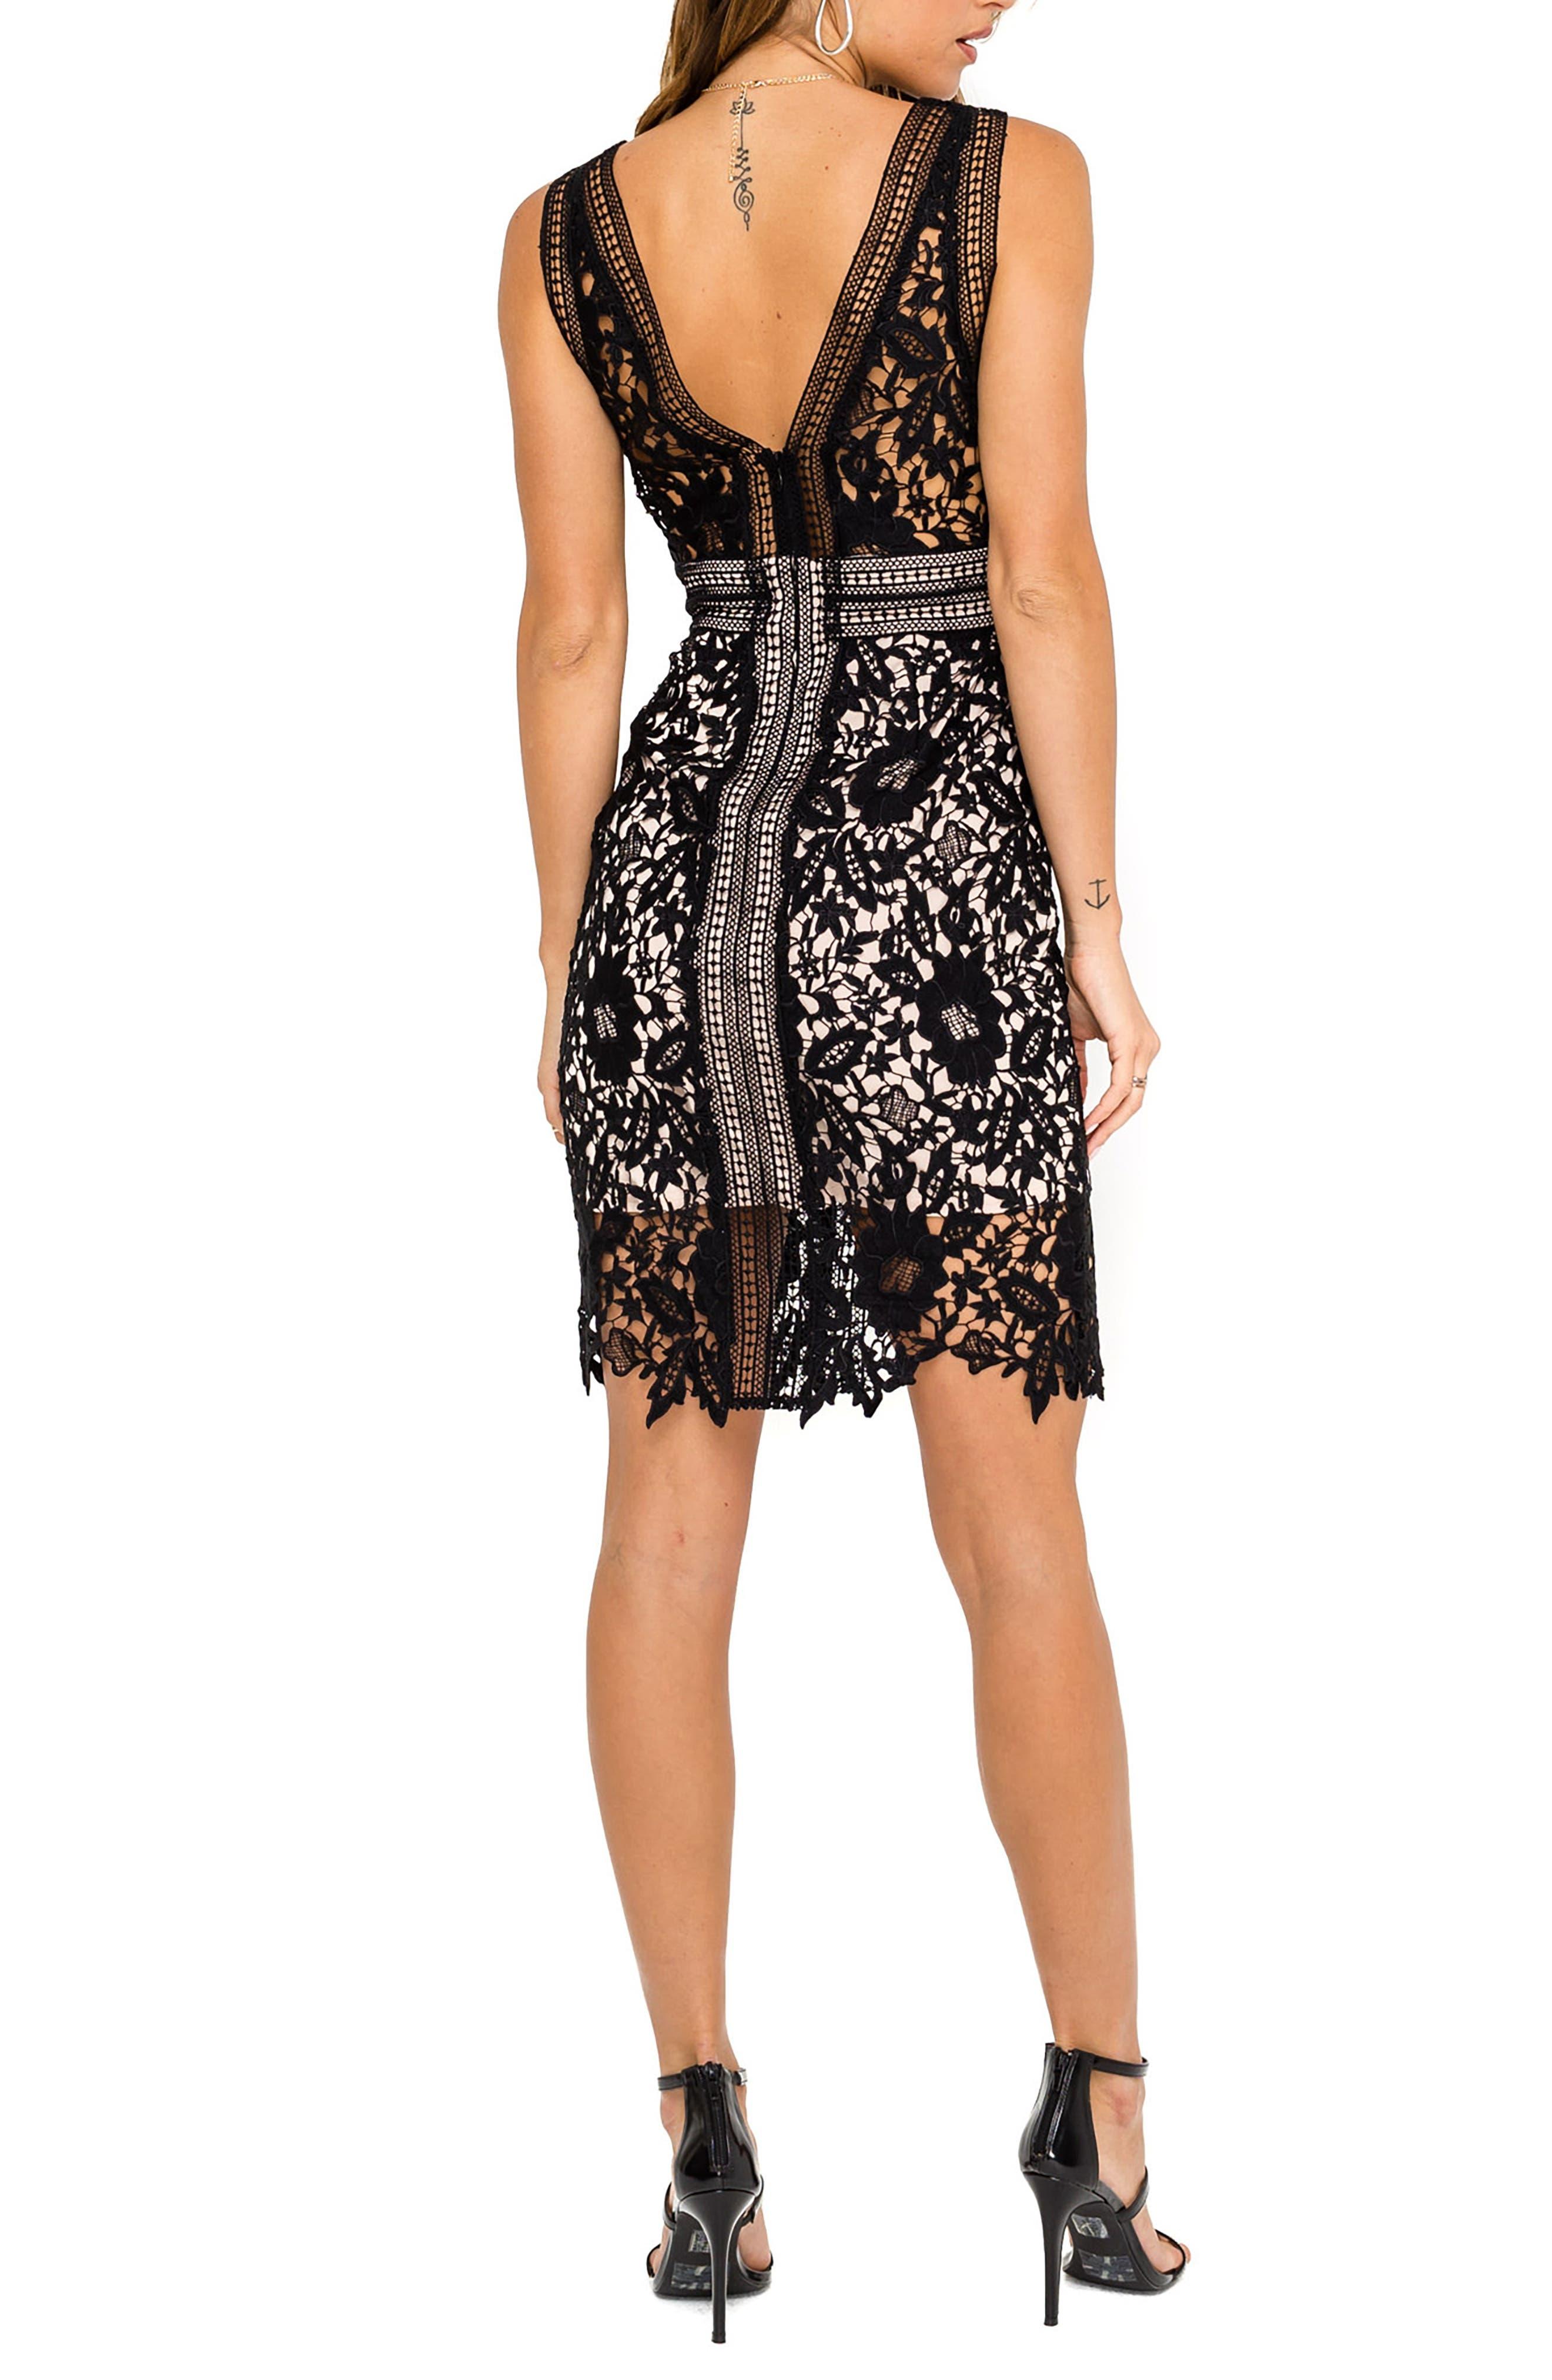 ASTR THE LABEL, Lace Sheath Dress, Alternate thumbnail 2, color, 001